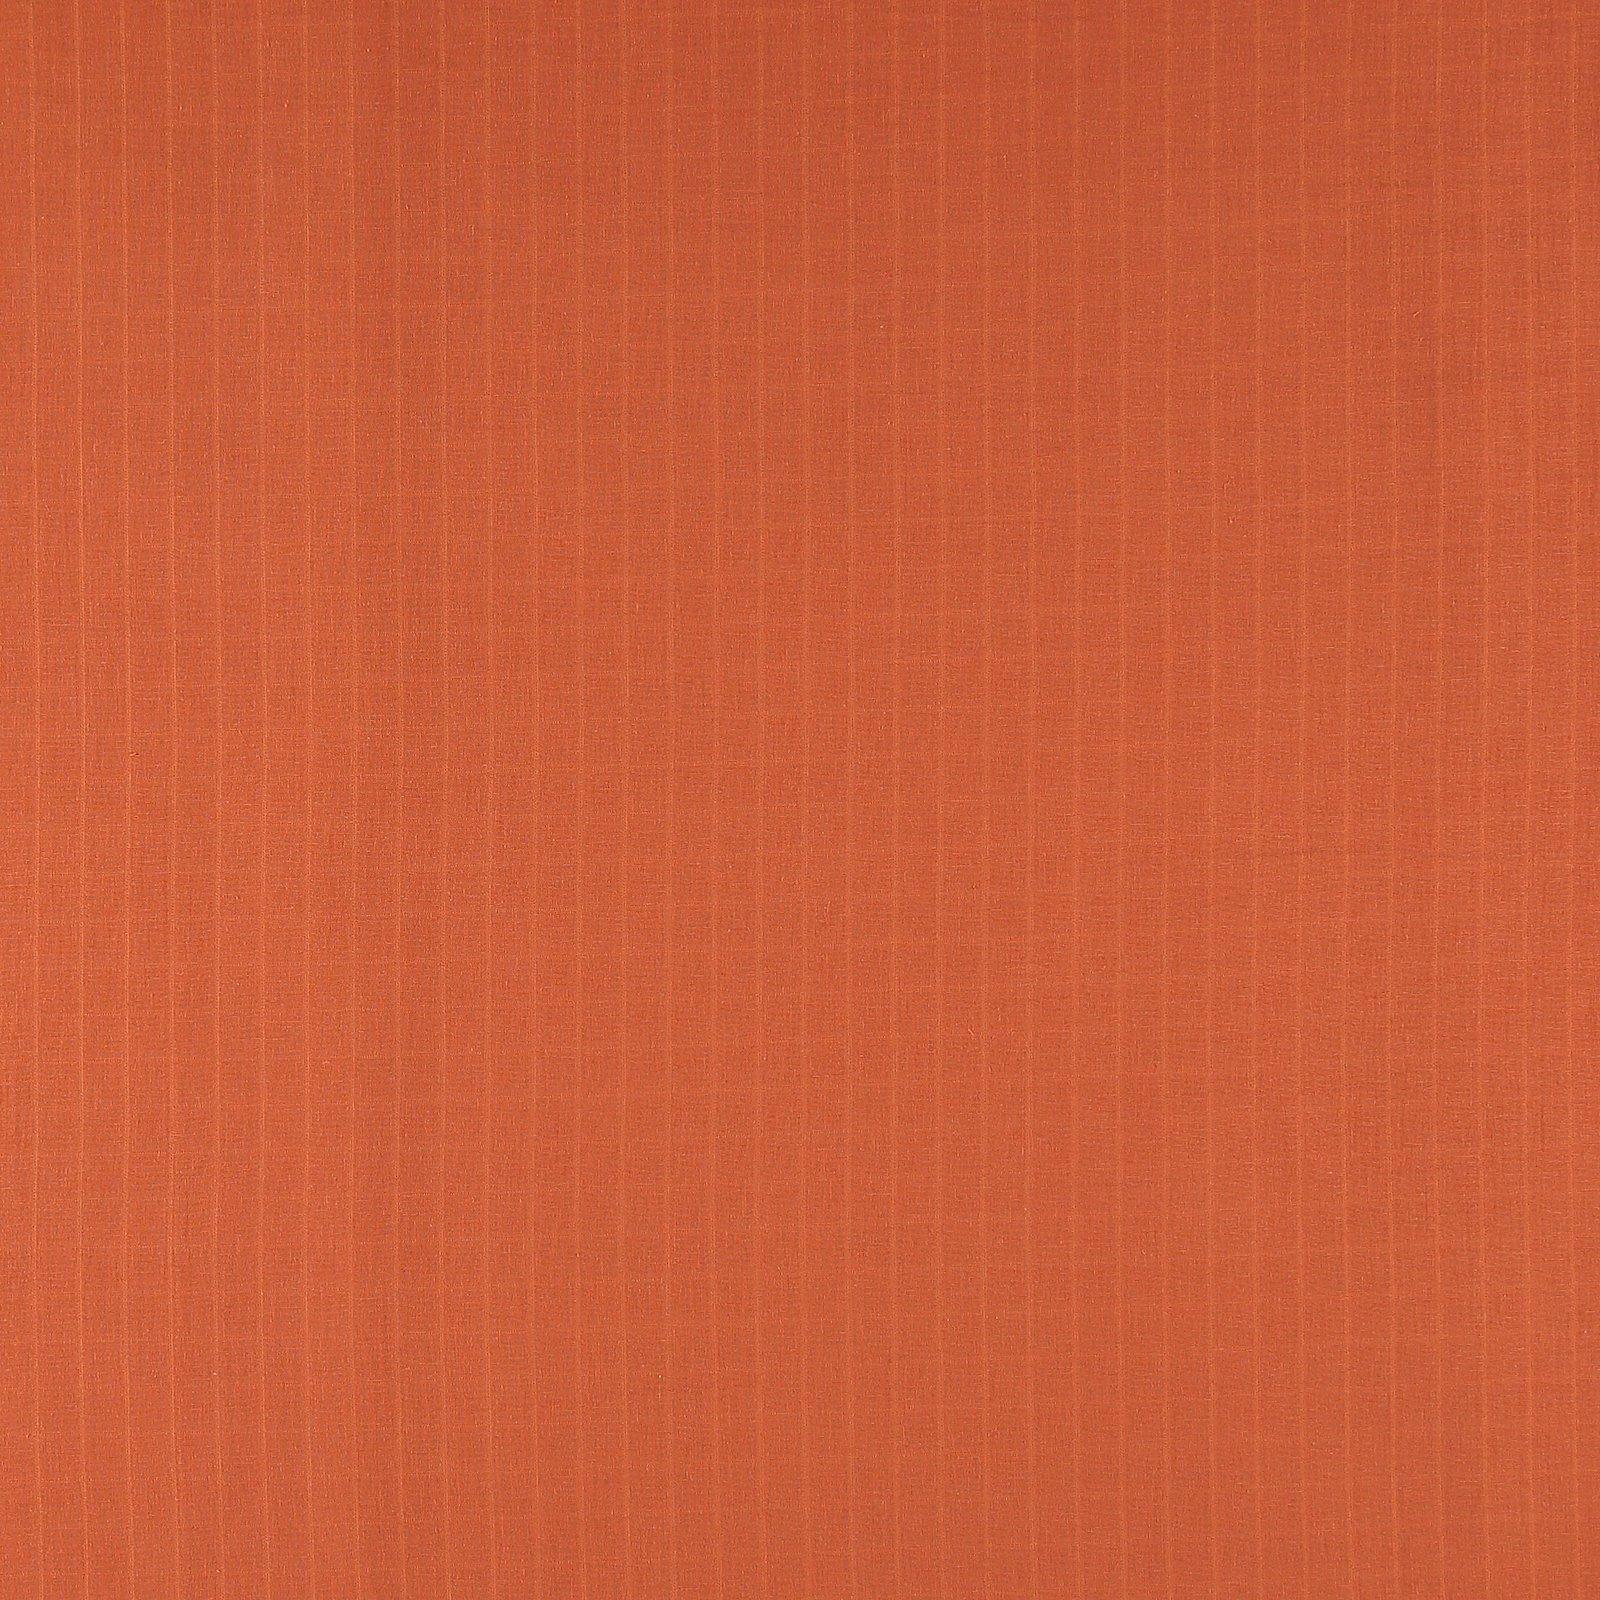 Muslin terracotta 500012_pack_solid